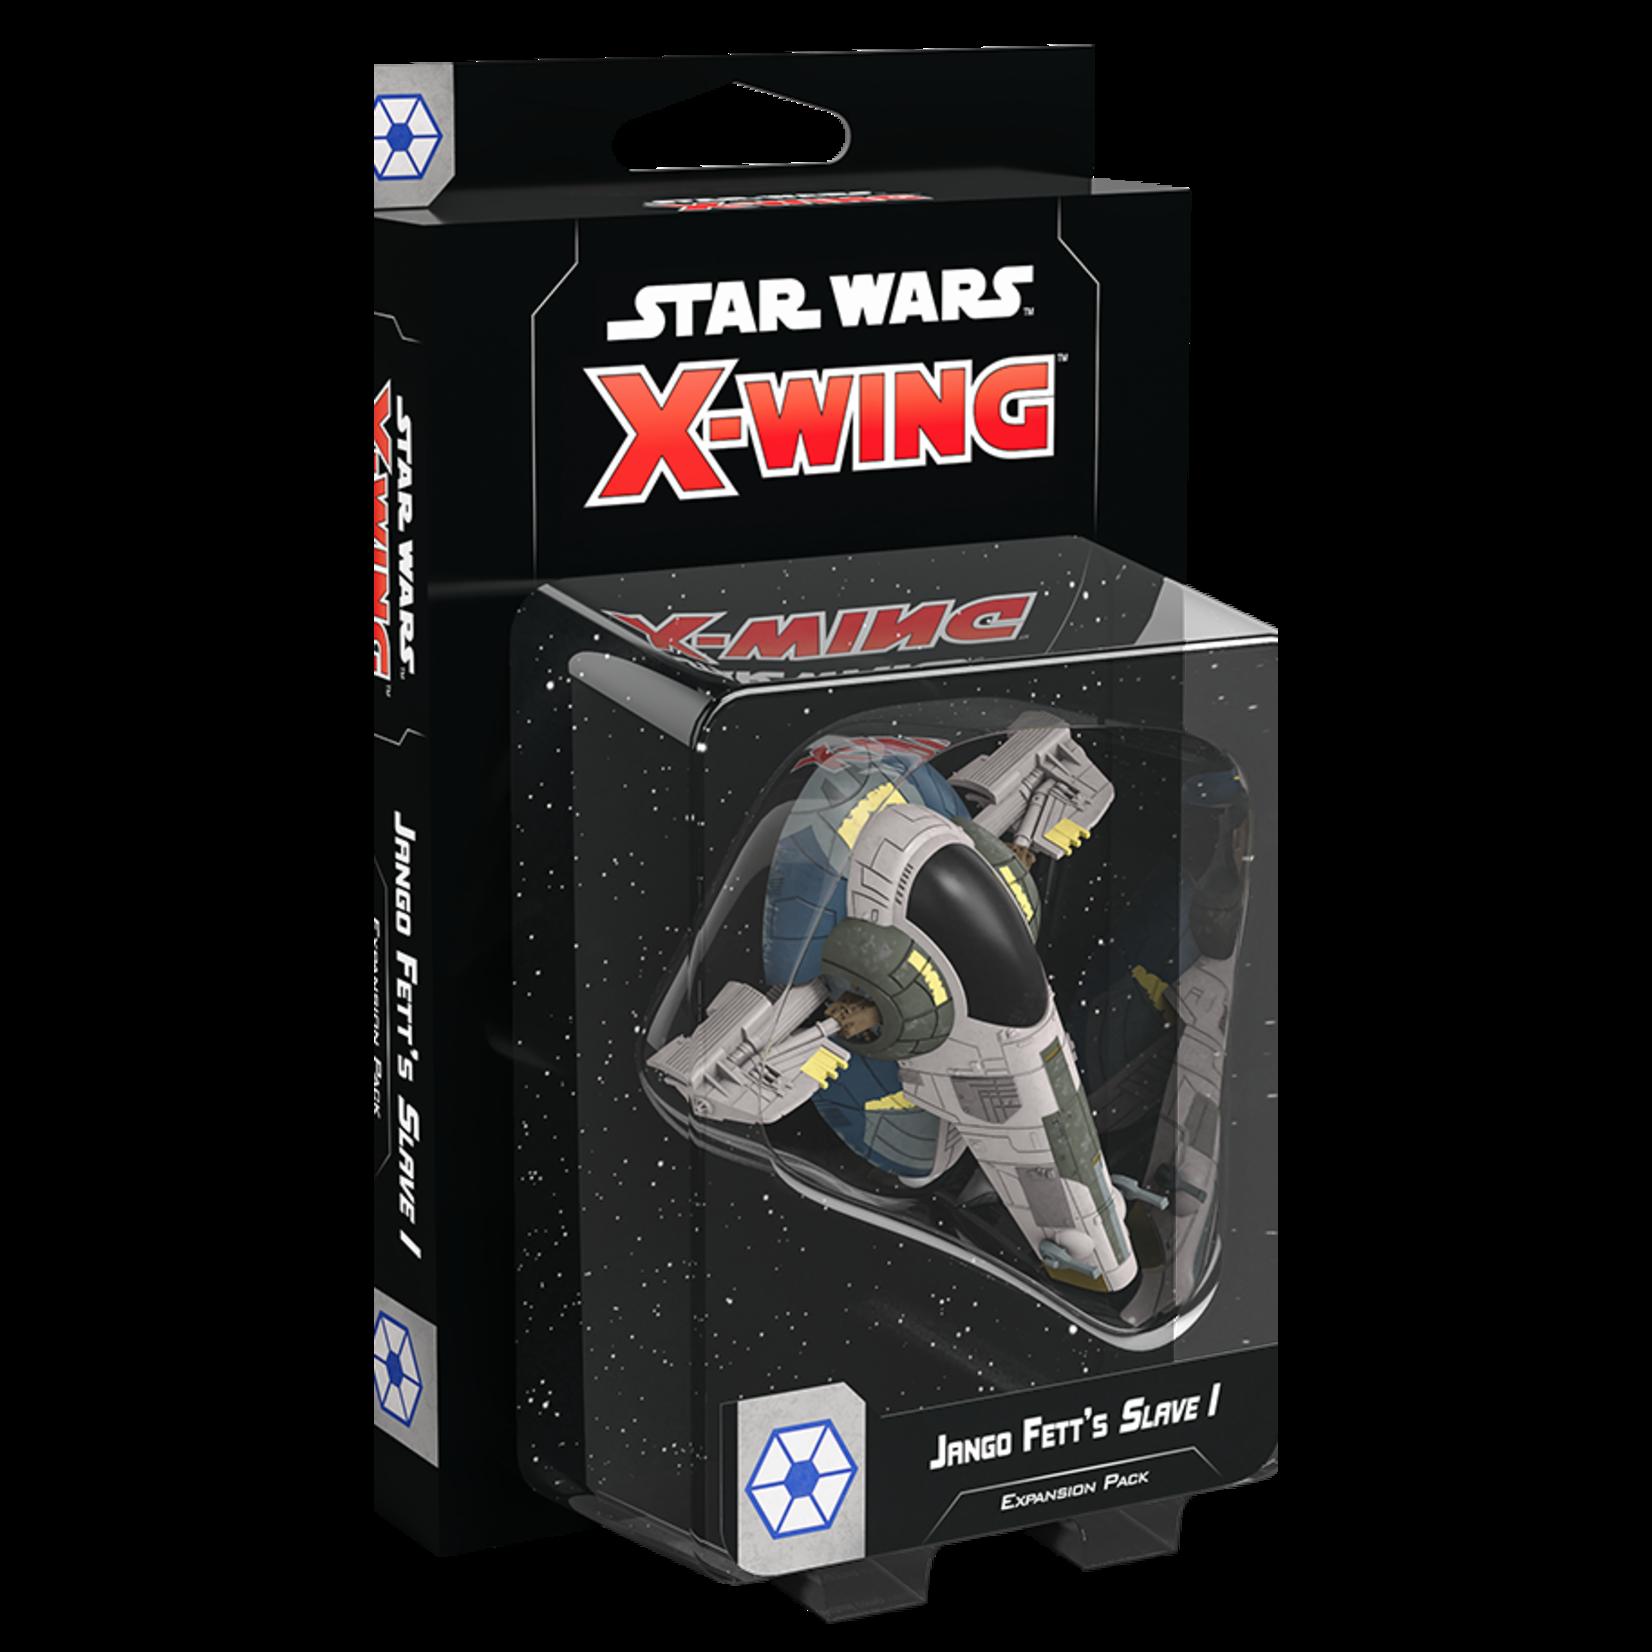 Fantasy Flight Games Star Wars X-Wing: 2nd Edition - Jango Fett's Slave 1 Expansion